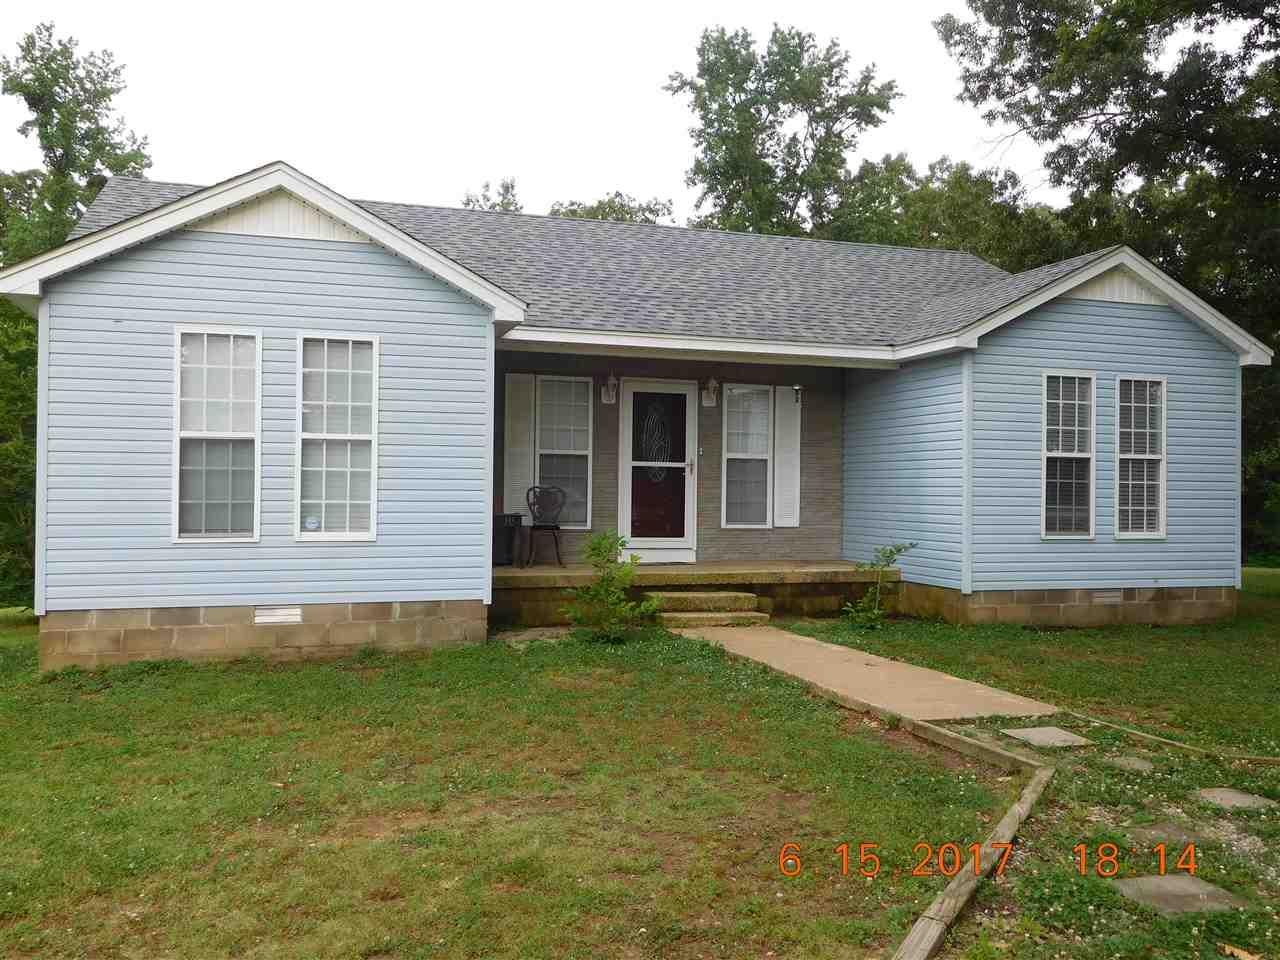 1633 Hardin Graveyard Adamsville, TN 38310 - MLS #: 10004870